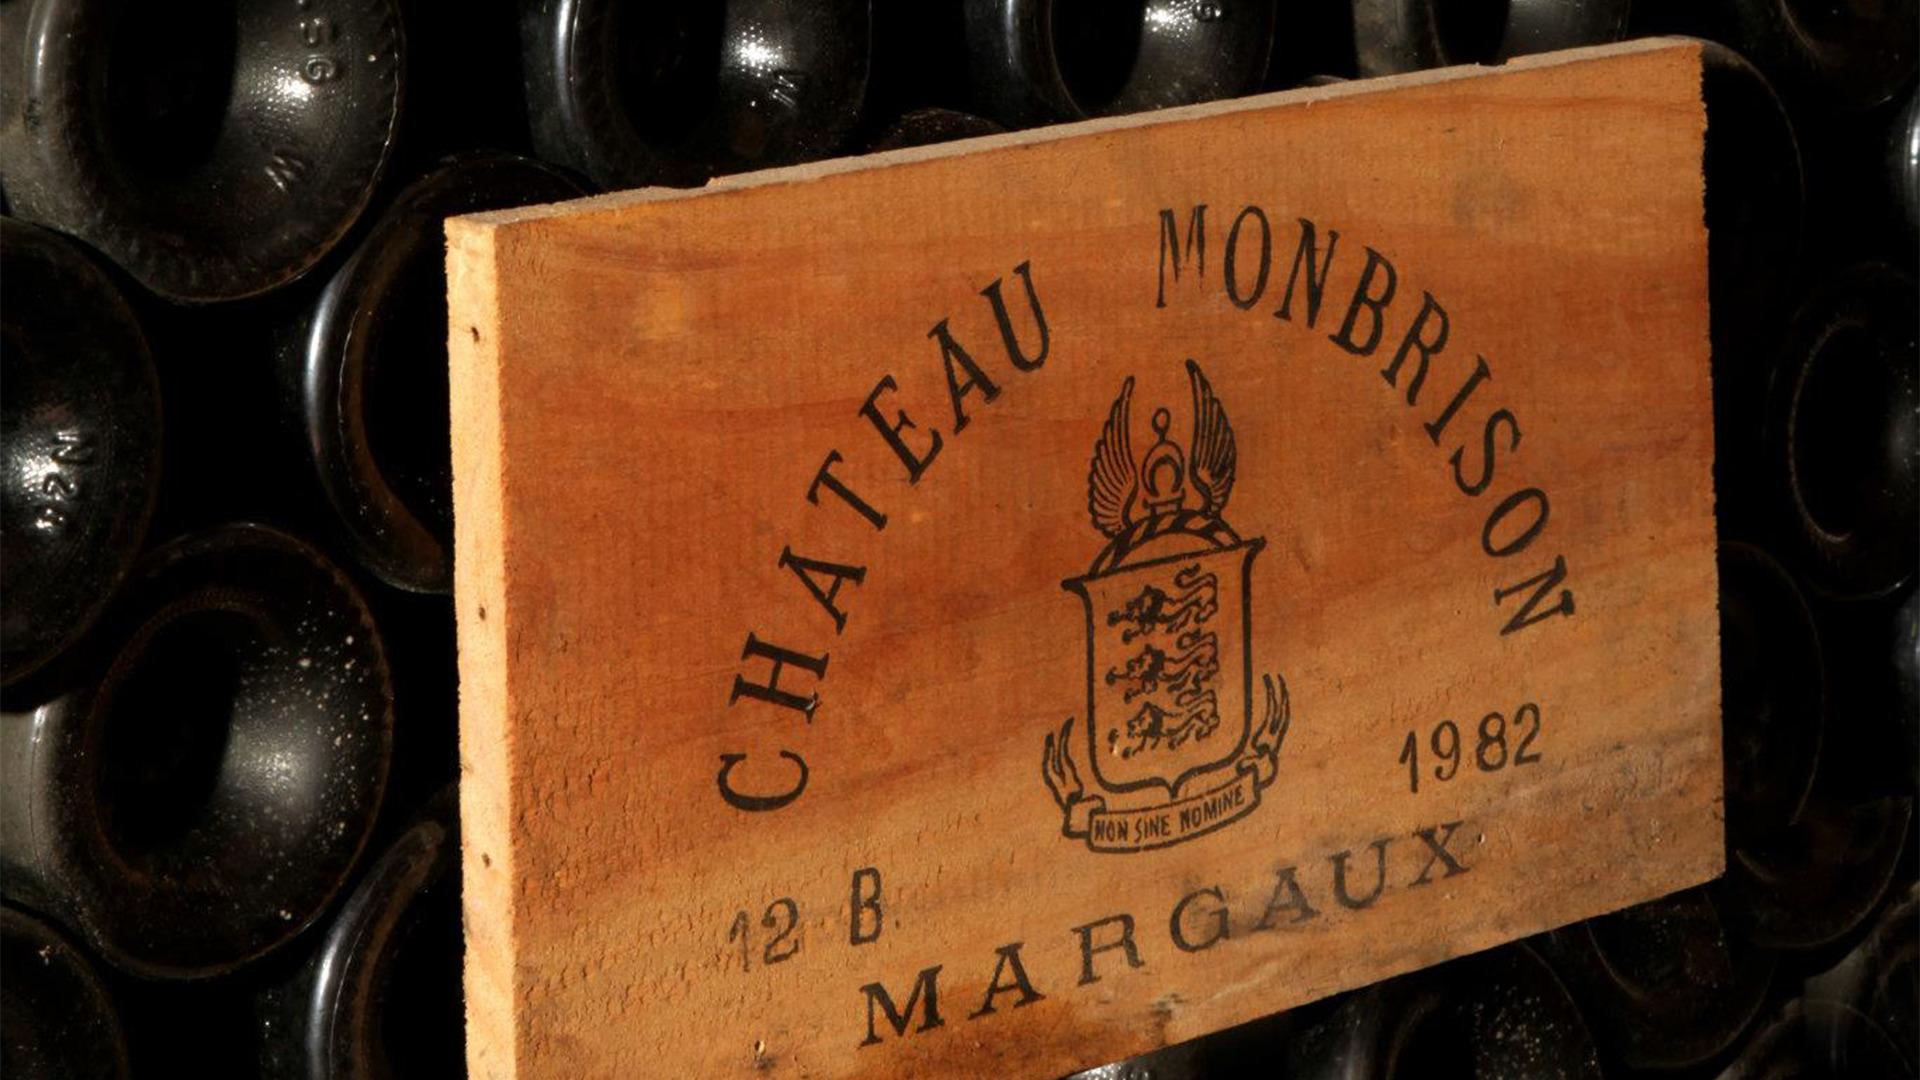 Rượu Vang Chateau Monbrison